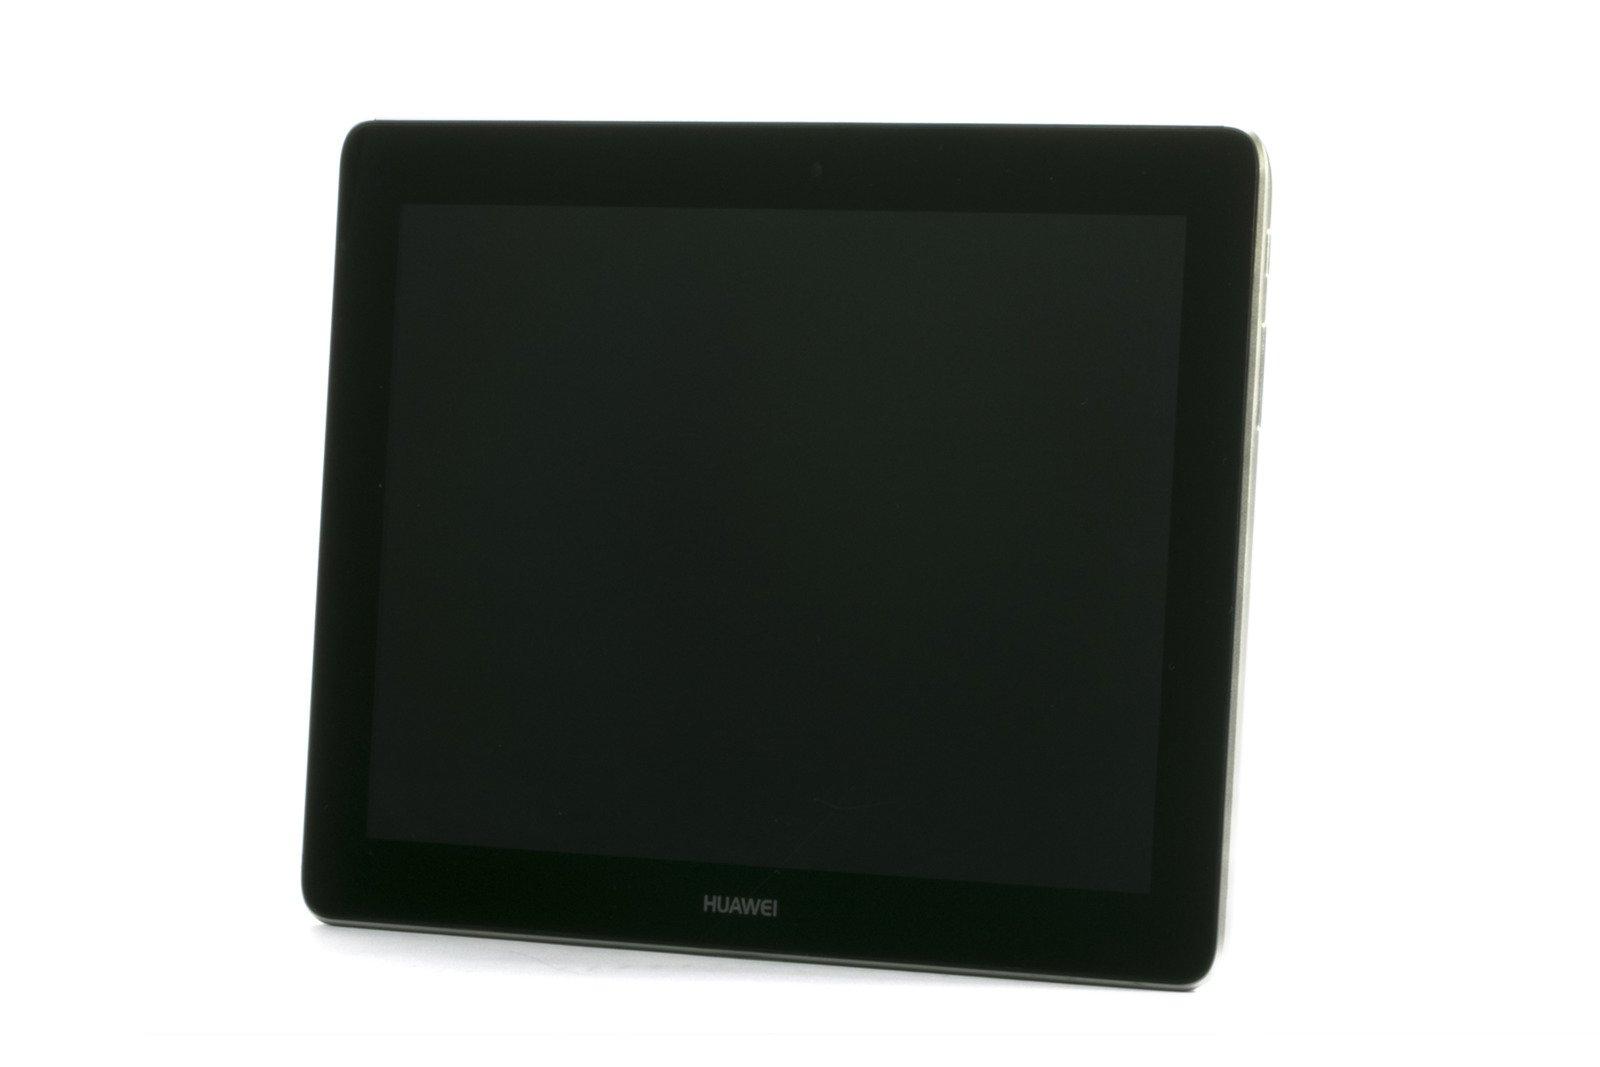 Huawei MediaPad 10 FHD S10-101L Descargar Controlador